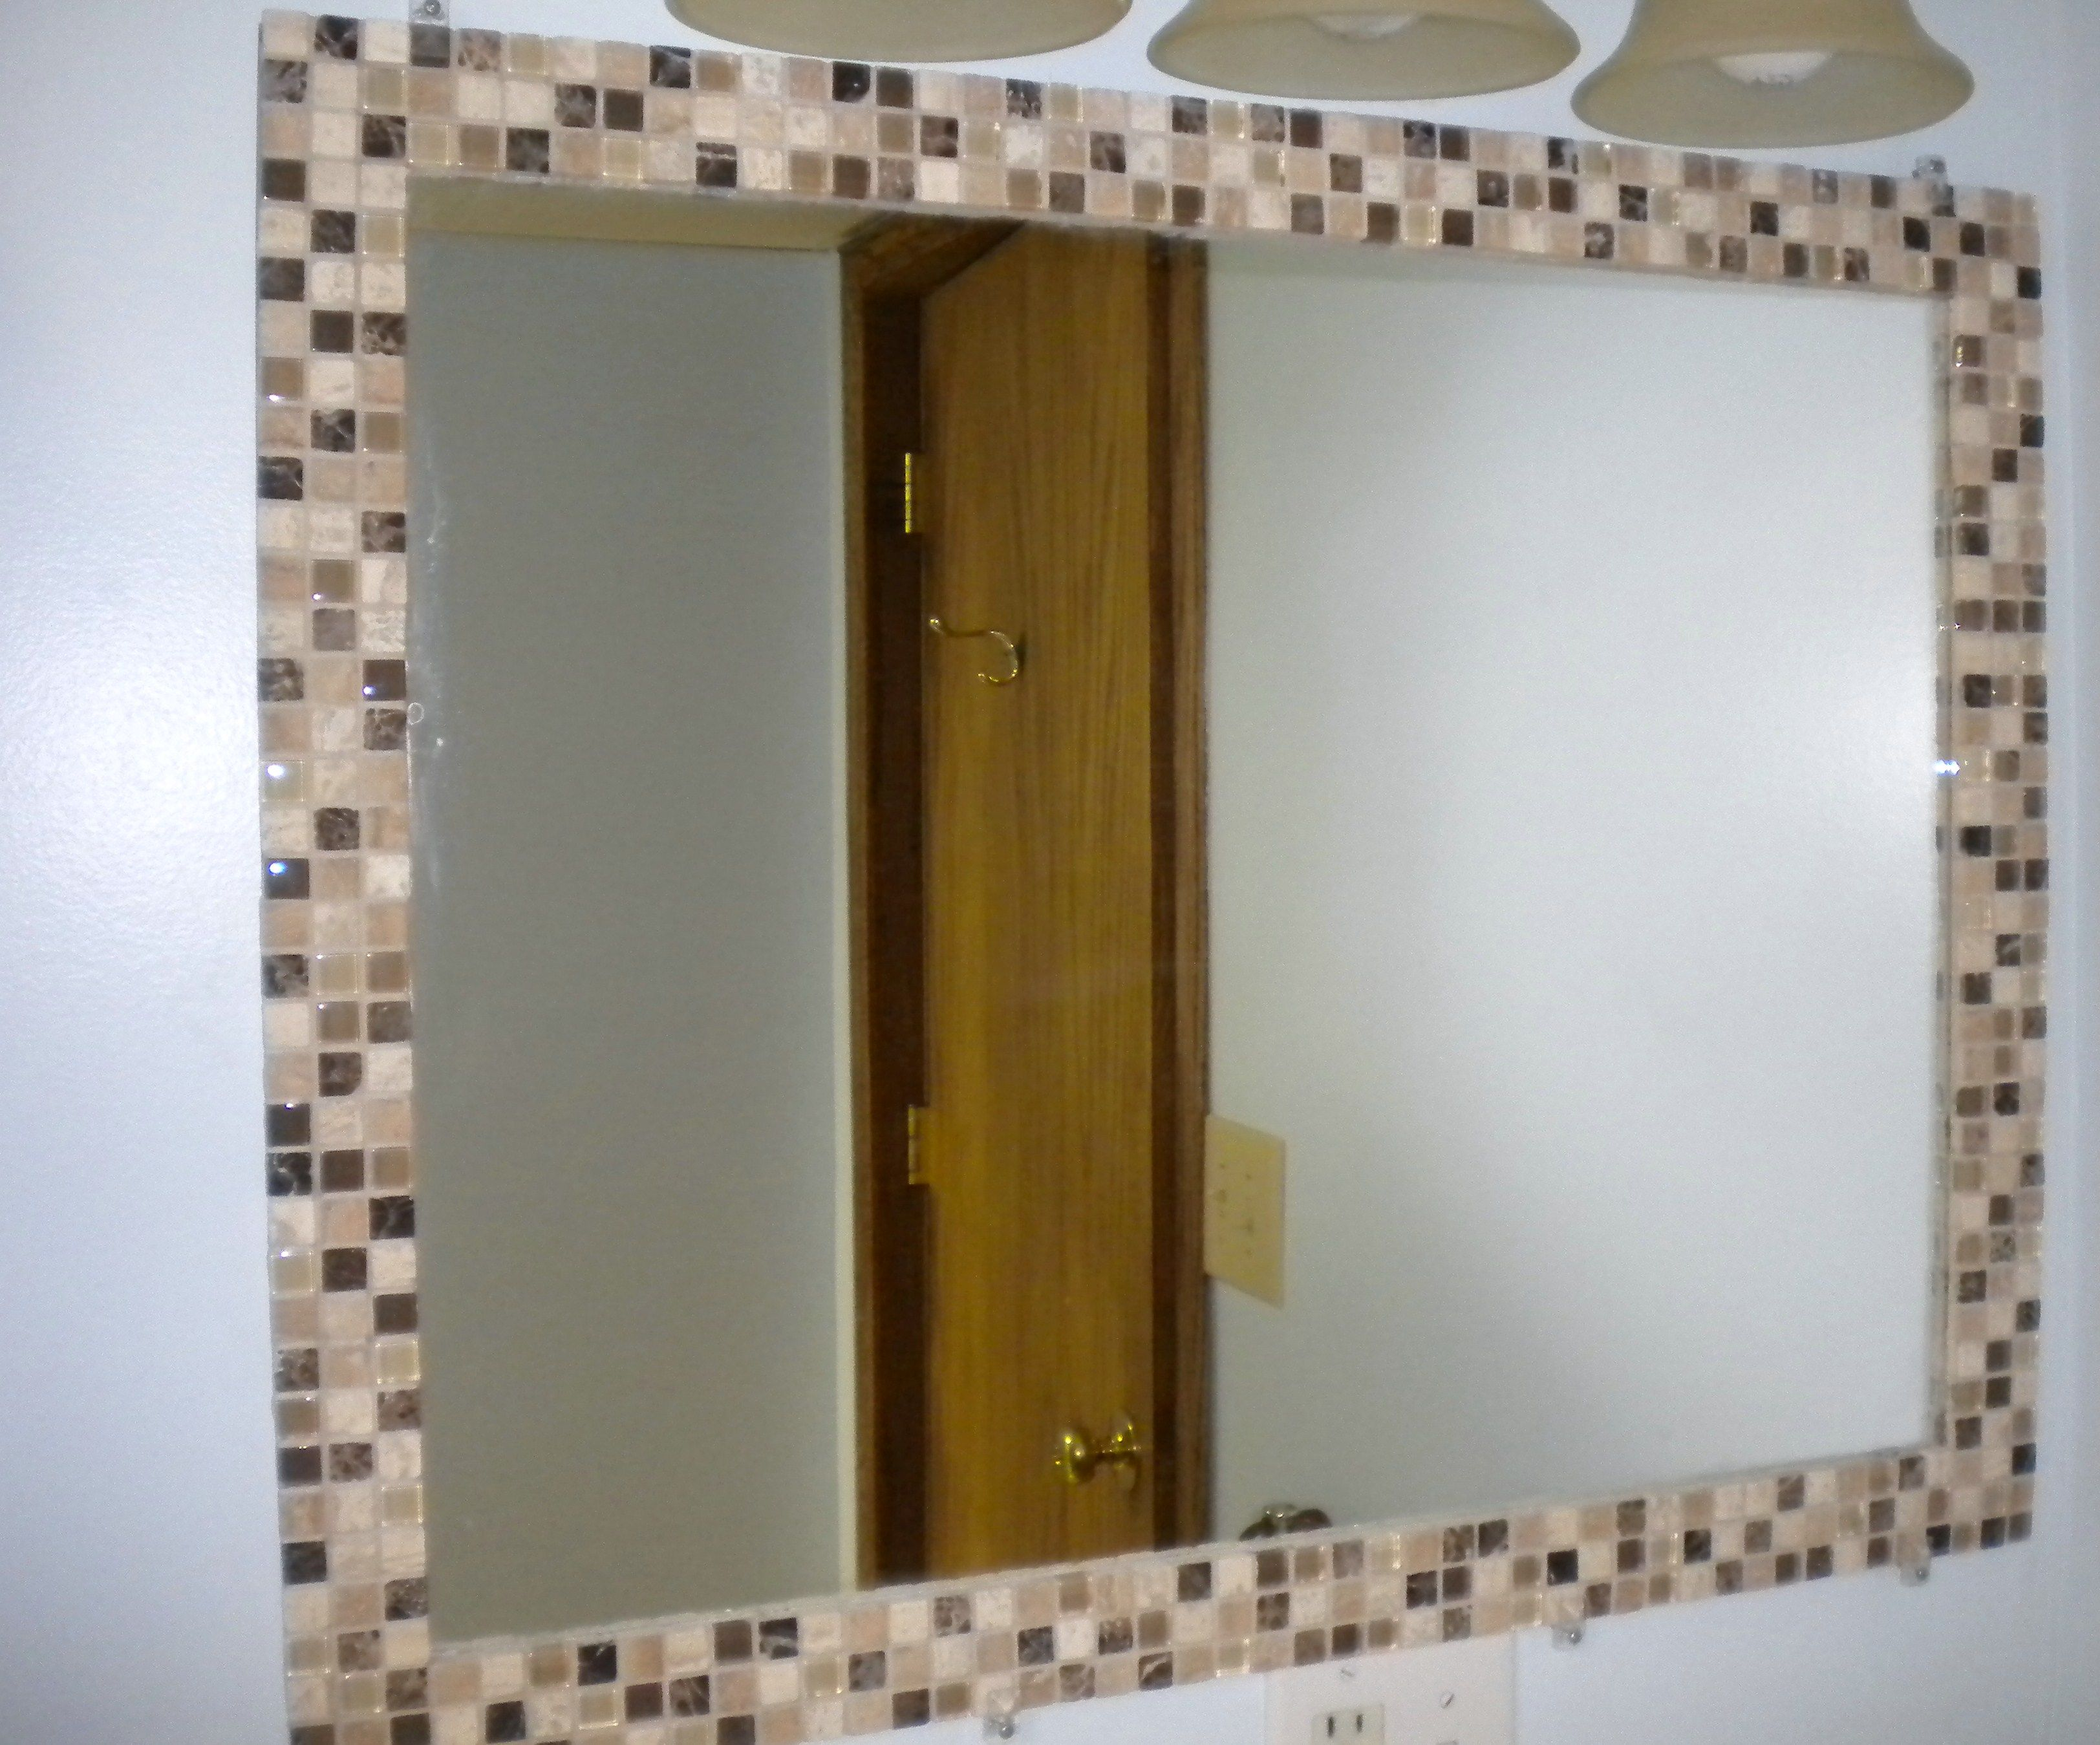 Diy Mosaic Tile Bathroom Mirror: DIY Mosaic Tile Mirror Border